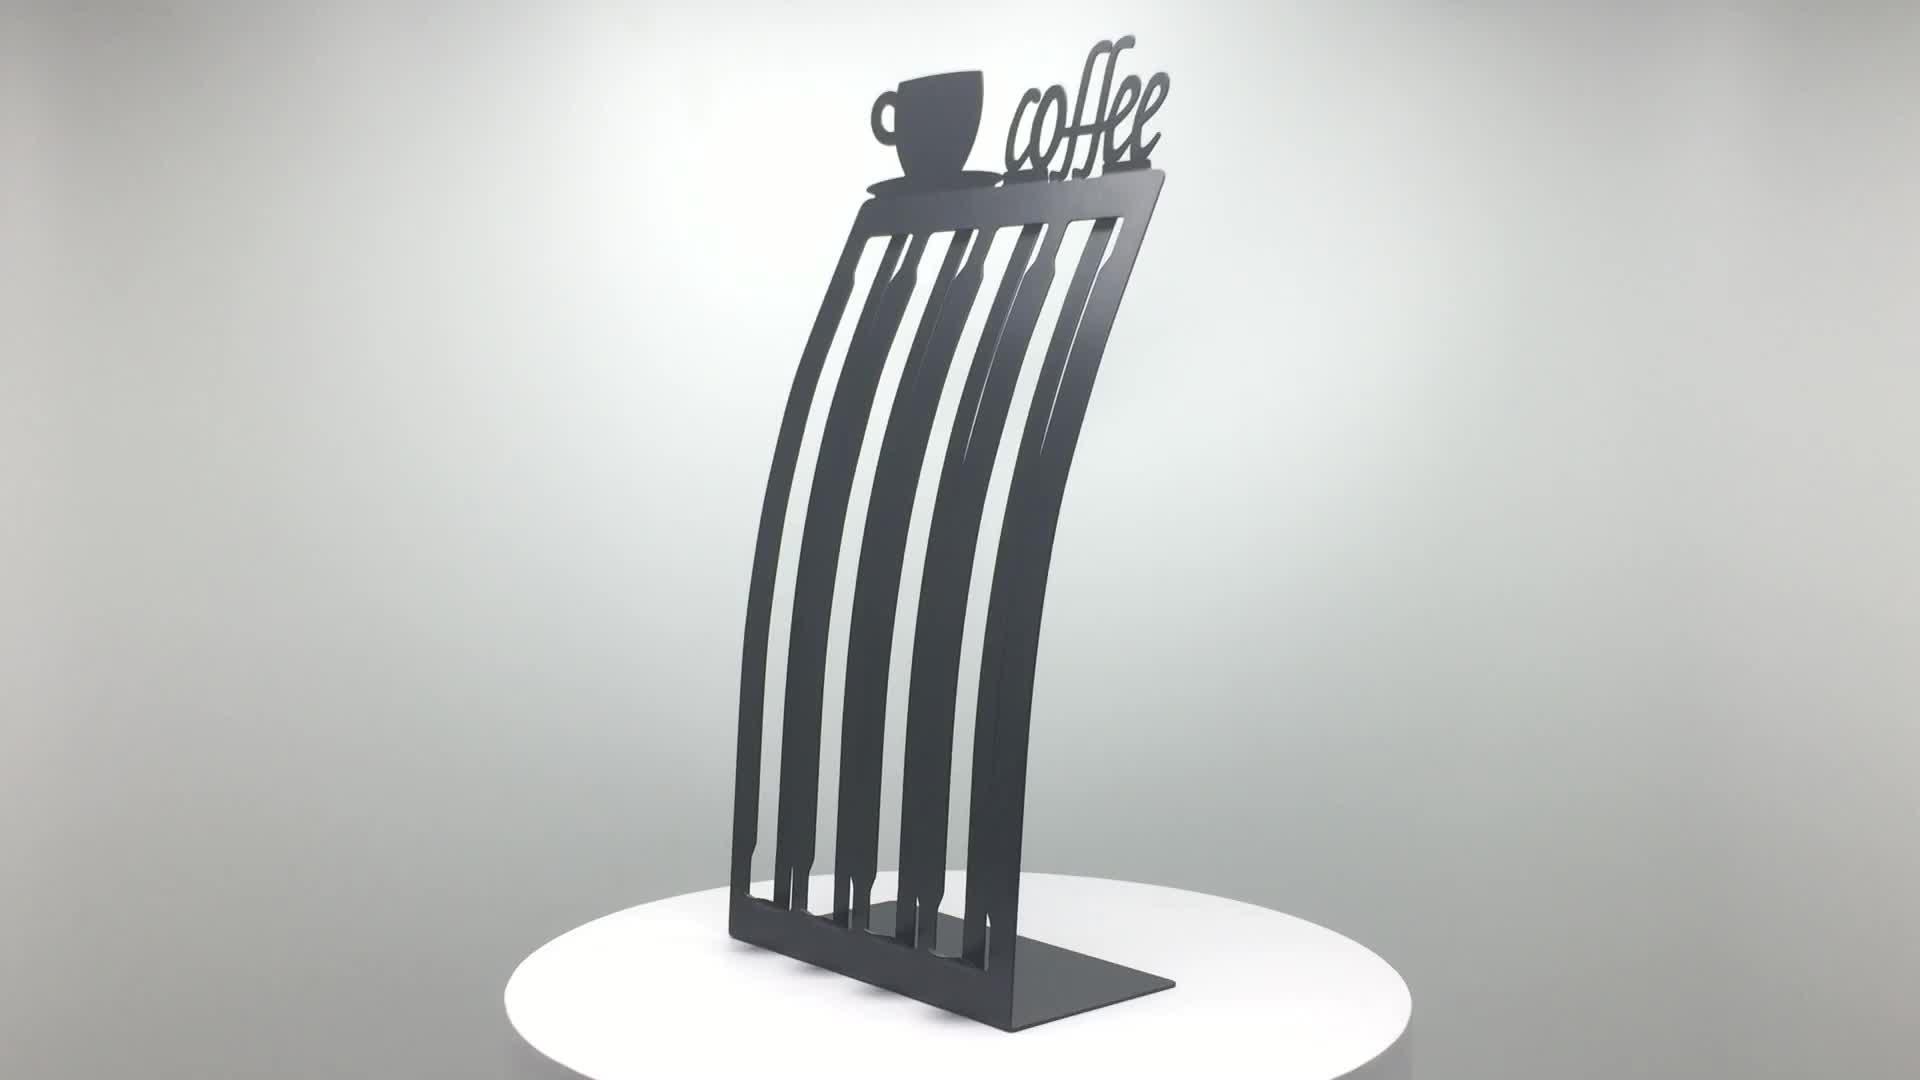 Home Kitchen Organizer ลวดโลหะถ้วยกาแฟ Pod Stand Nespresso Capsule Holder